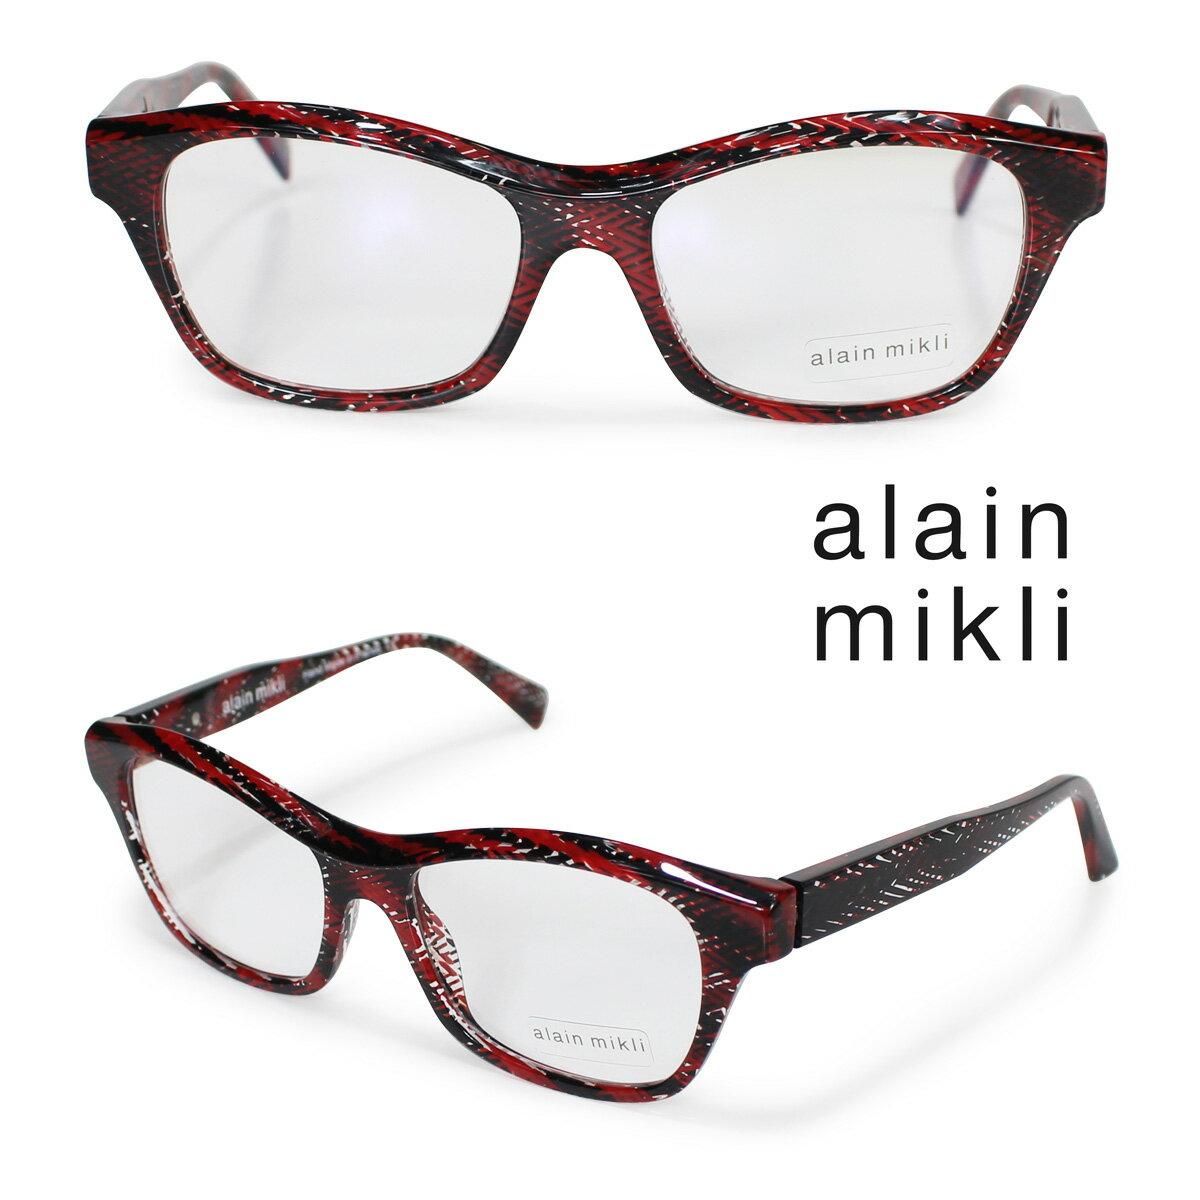 alain mikli メガネ アランミクリ メガネフレーム 眼鏡 フランス製 メンズ レディース